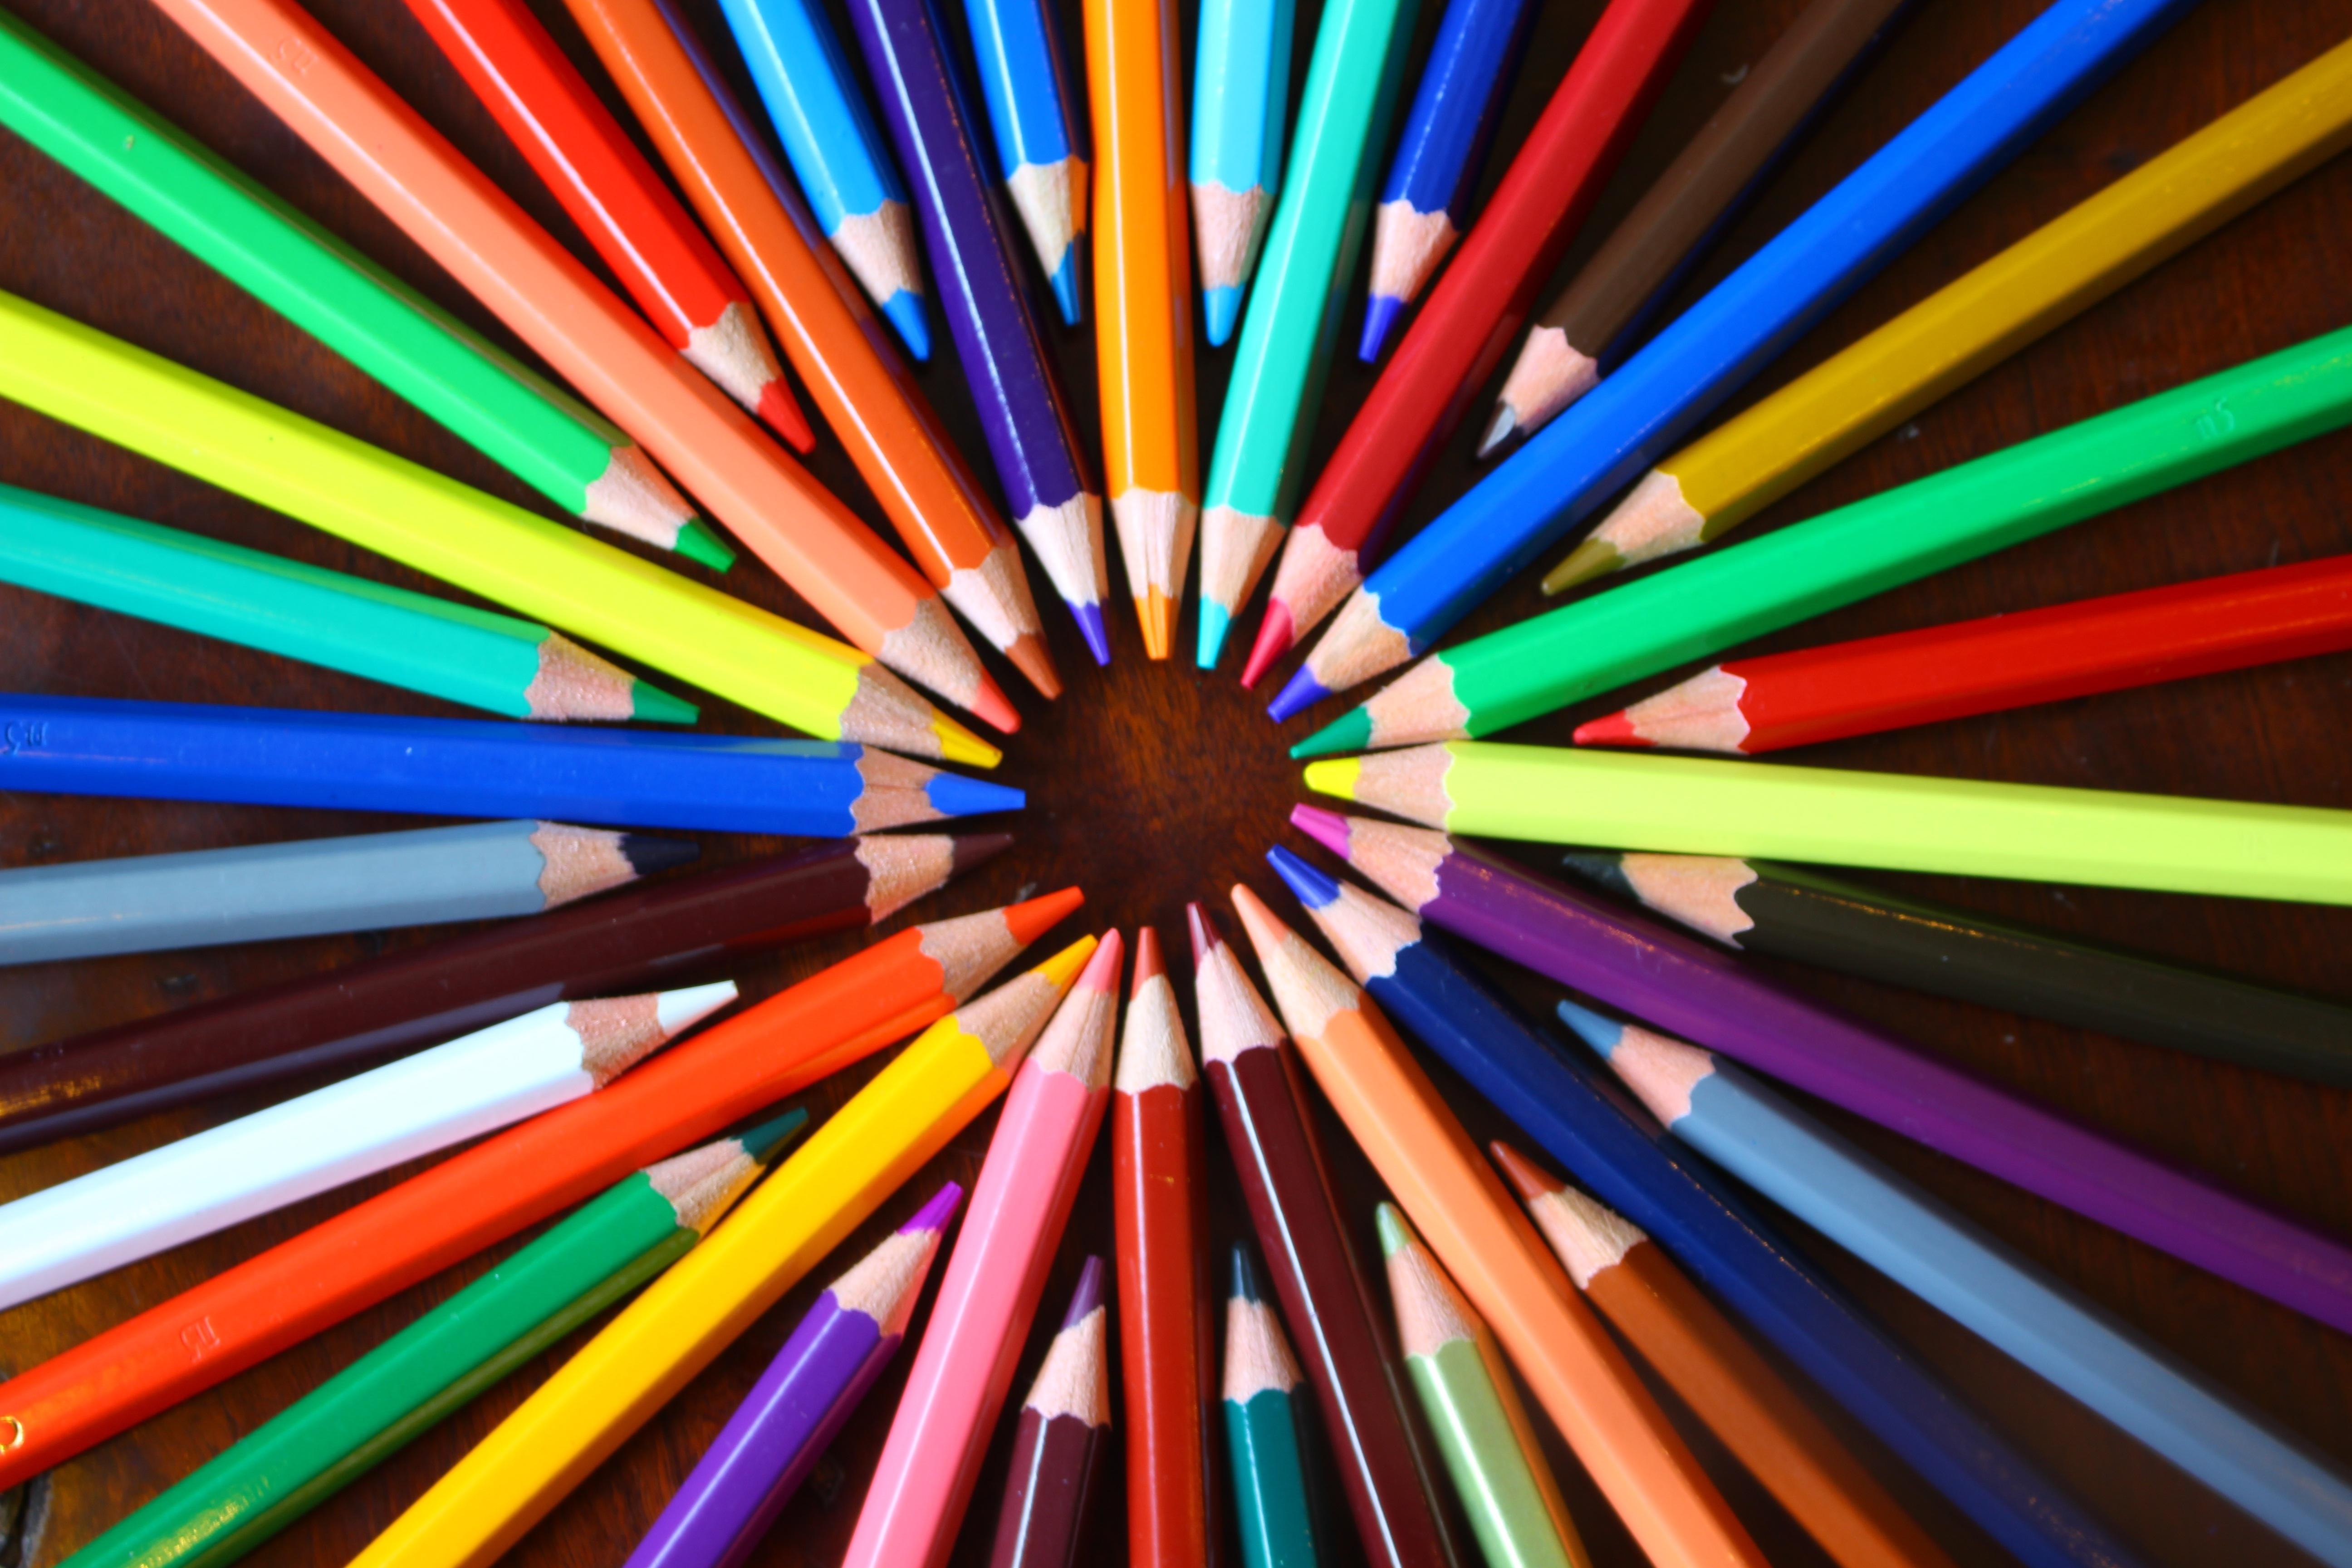 Free stock photo of wood, art, creative, desk